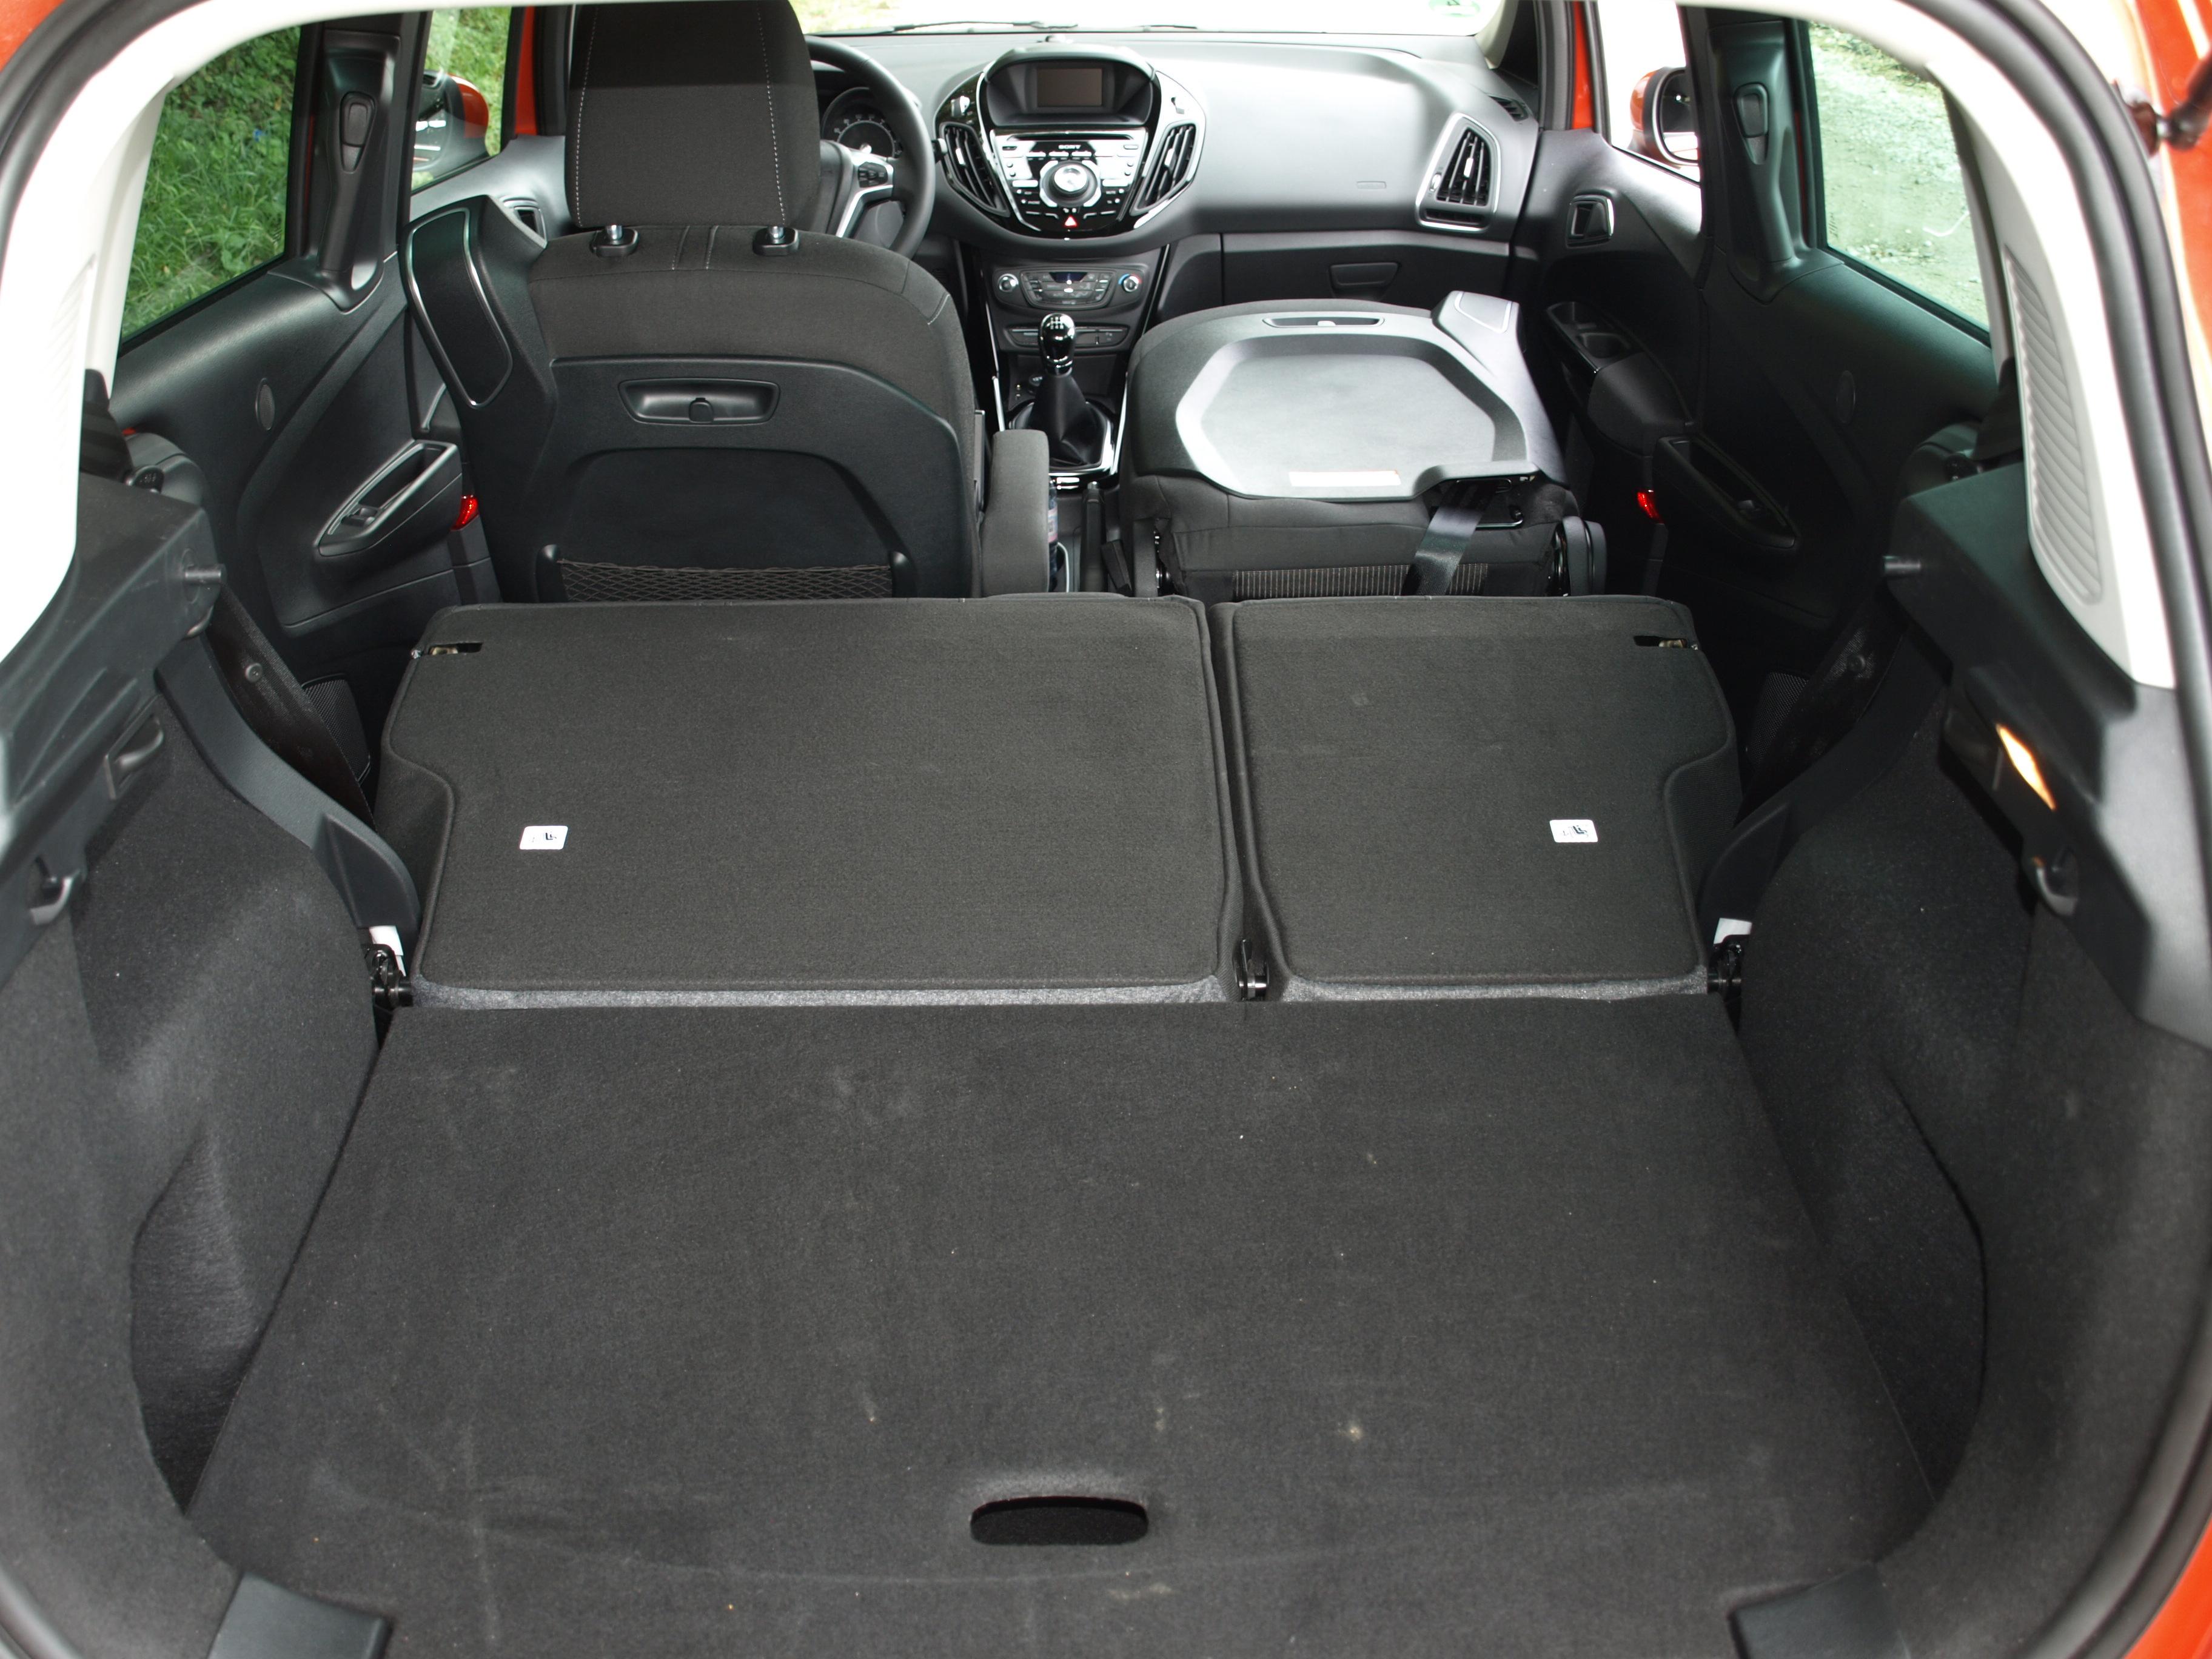 essai vid o ford b max fournisseur d 39 acc s. Black Bedroom Furniture Sets. Home Design Ideas